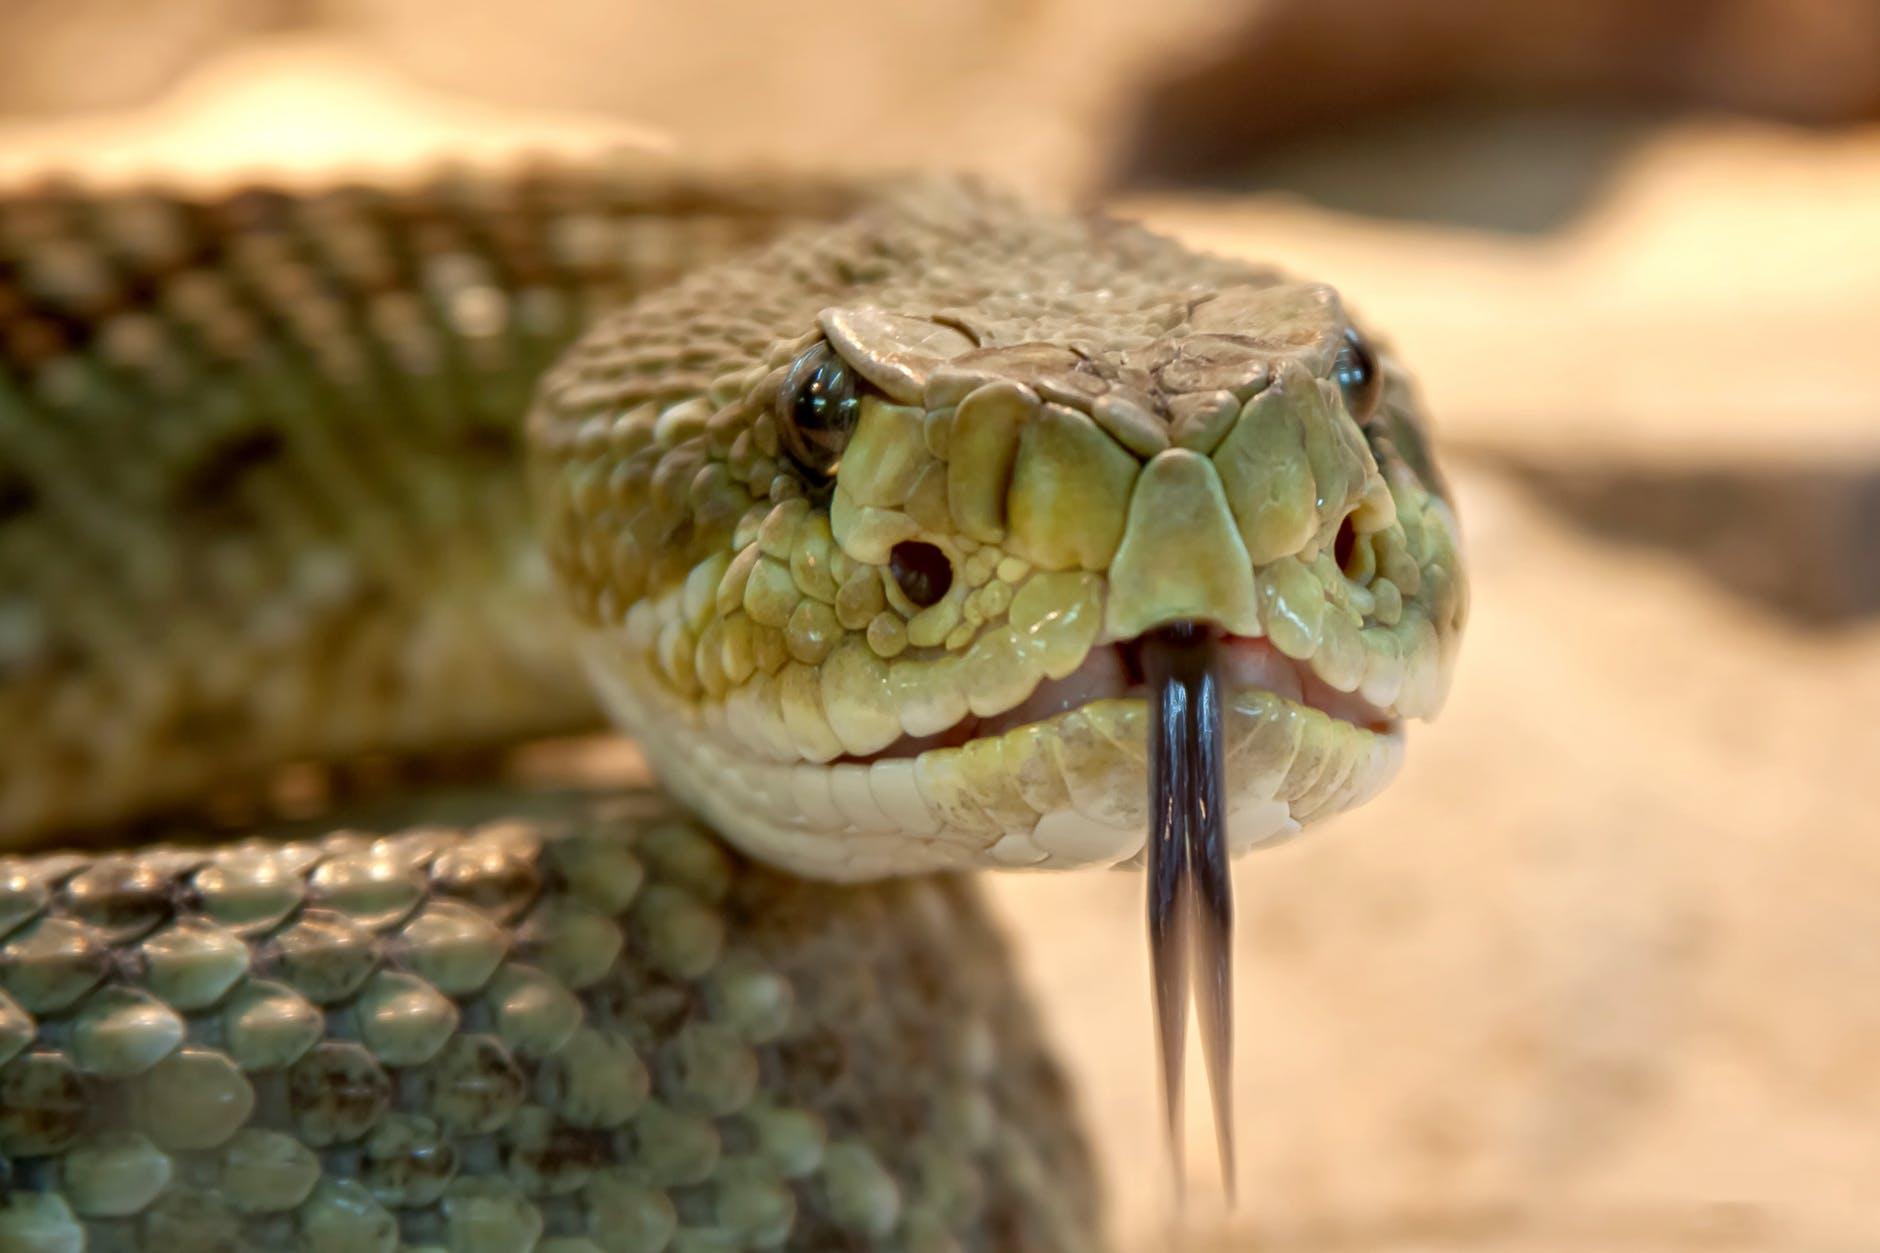 rattlesnake-toxic-snake-dangerous-38438.jpeg